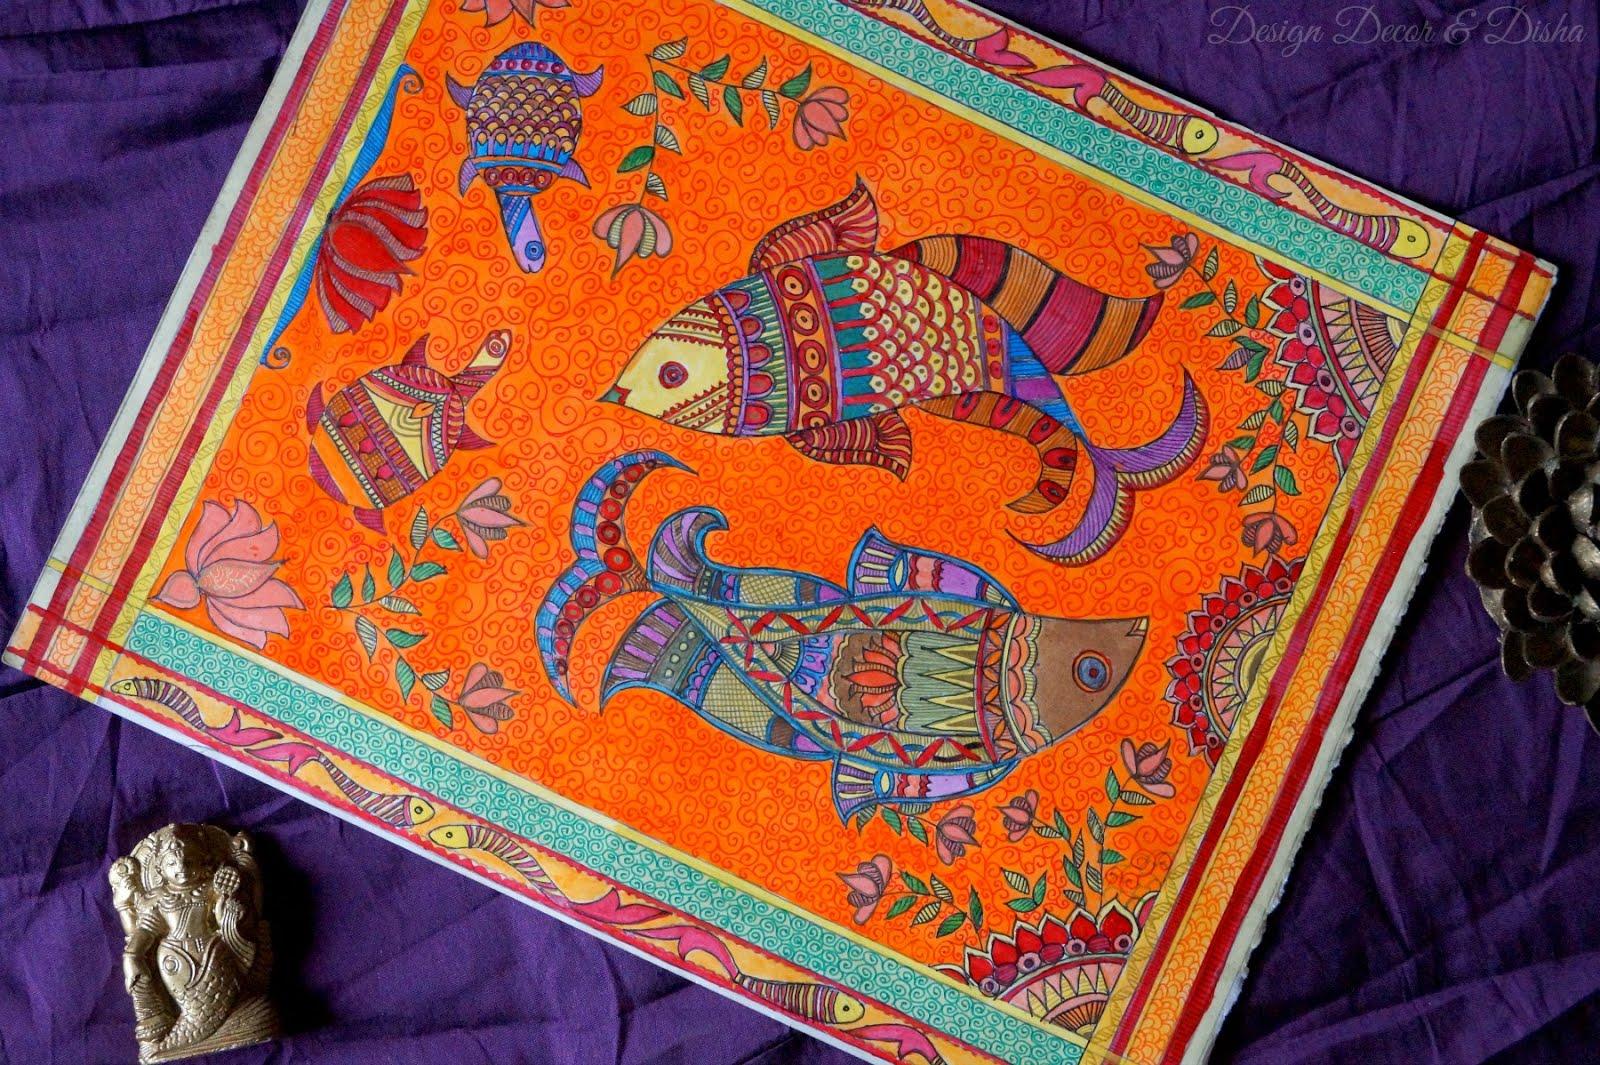 Design Decor Disha Indian Art Gallery Wall Madhubani Painting: home decor paintings for sale india